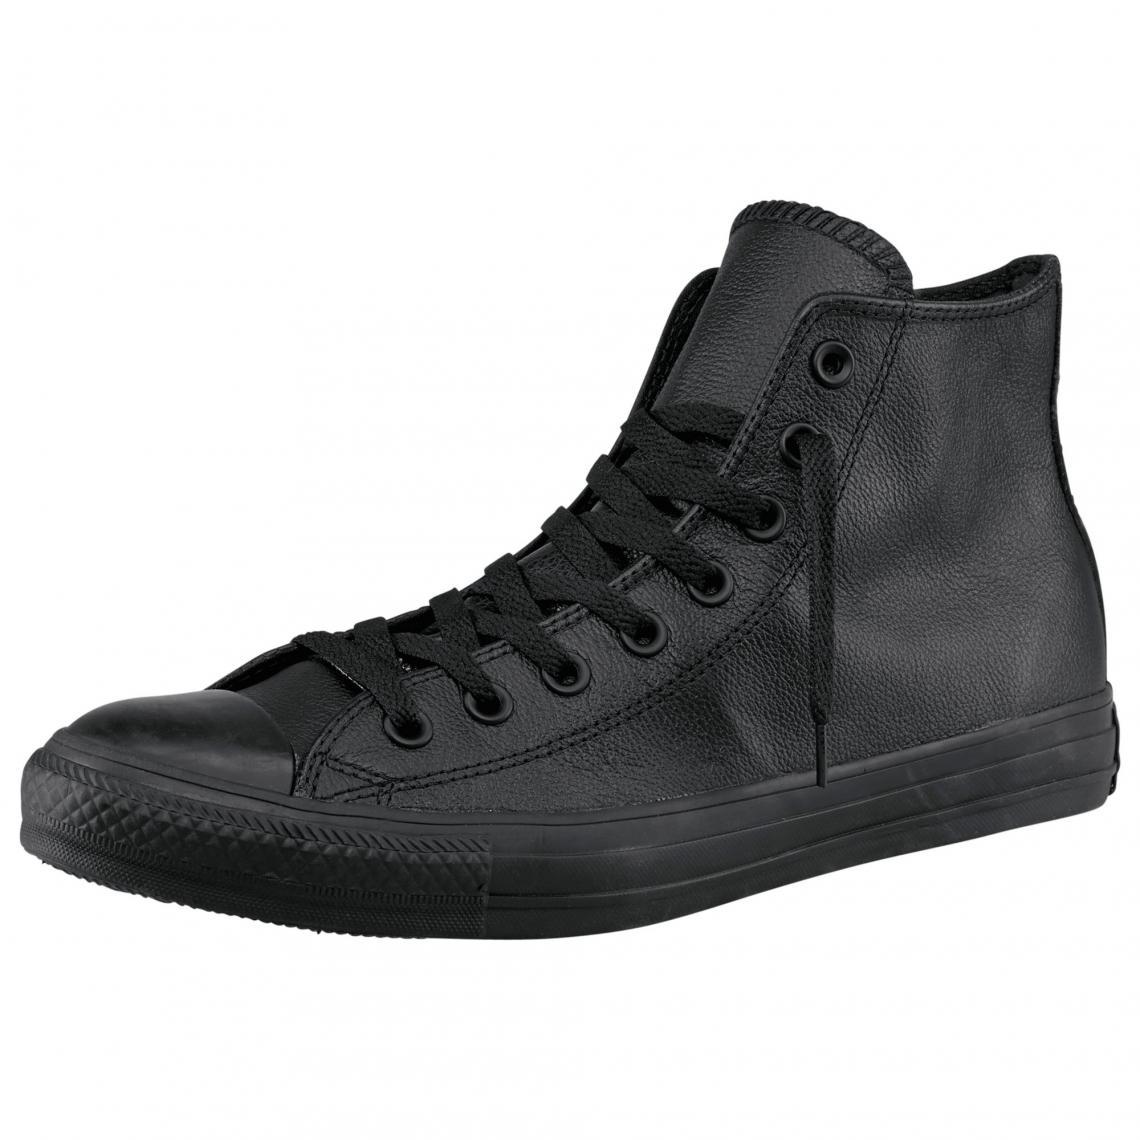 0f79a3d9a341e Converse Chuck Taylor All Star Core Mono baskets cuir homme - Noir Converse  Homme